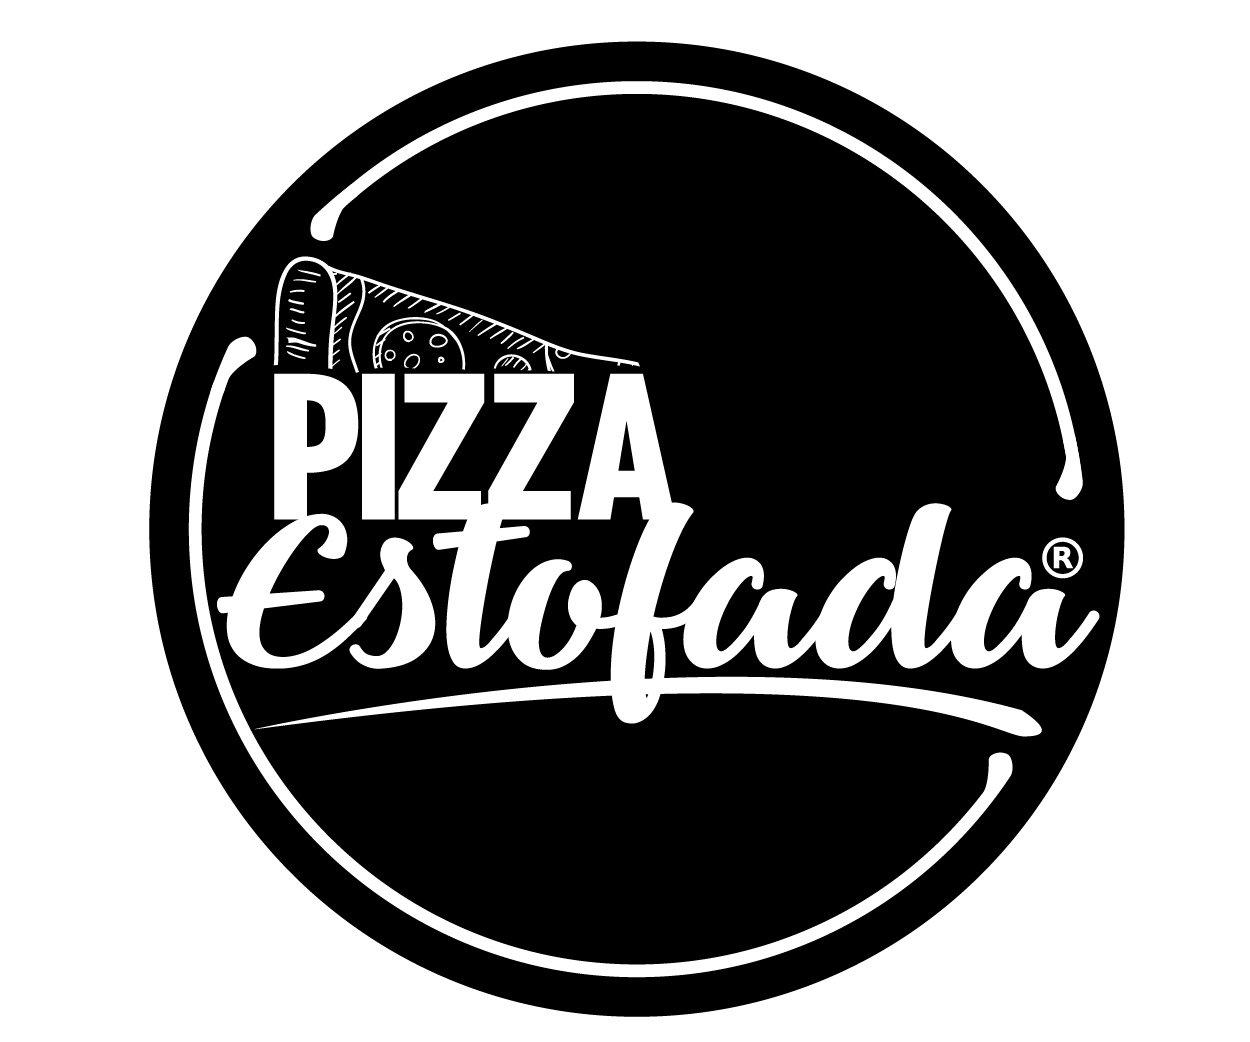 Pizza Estofada Sabaneta